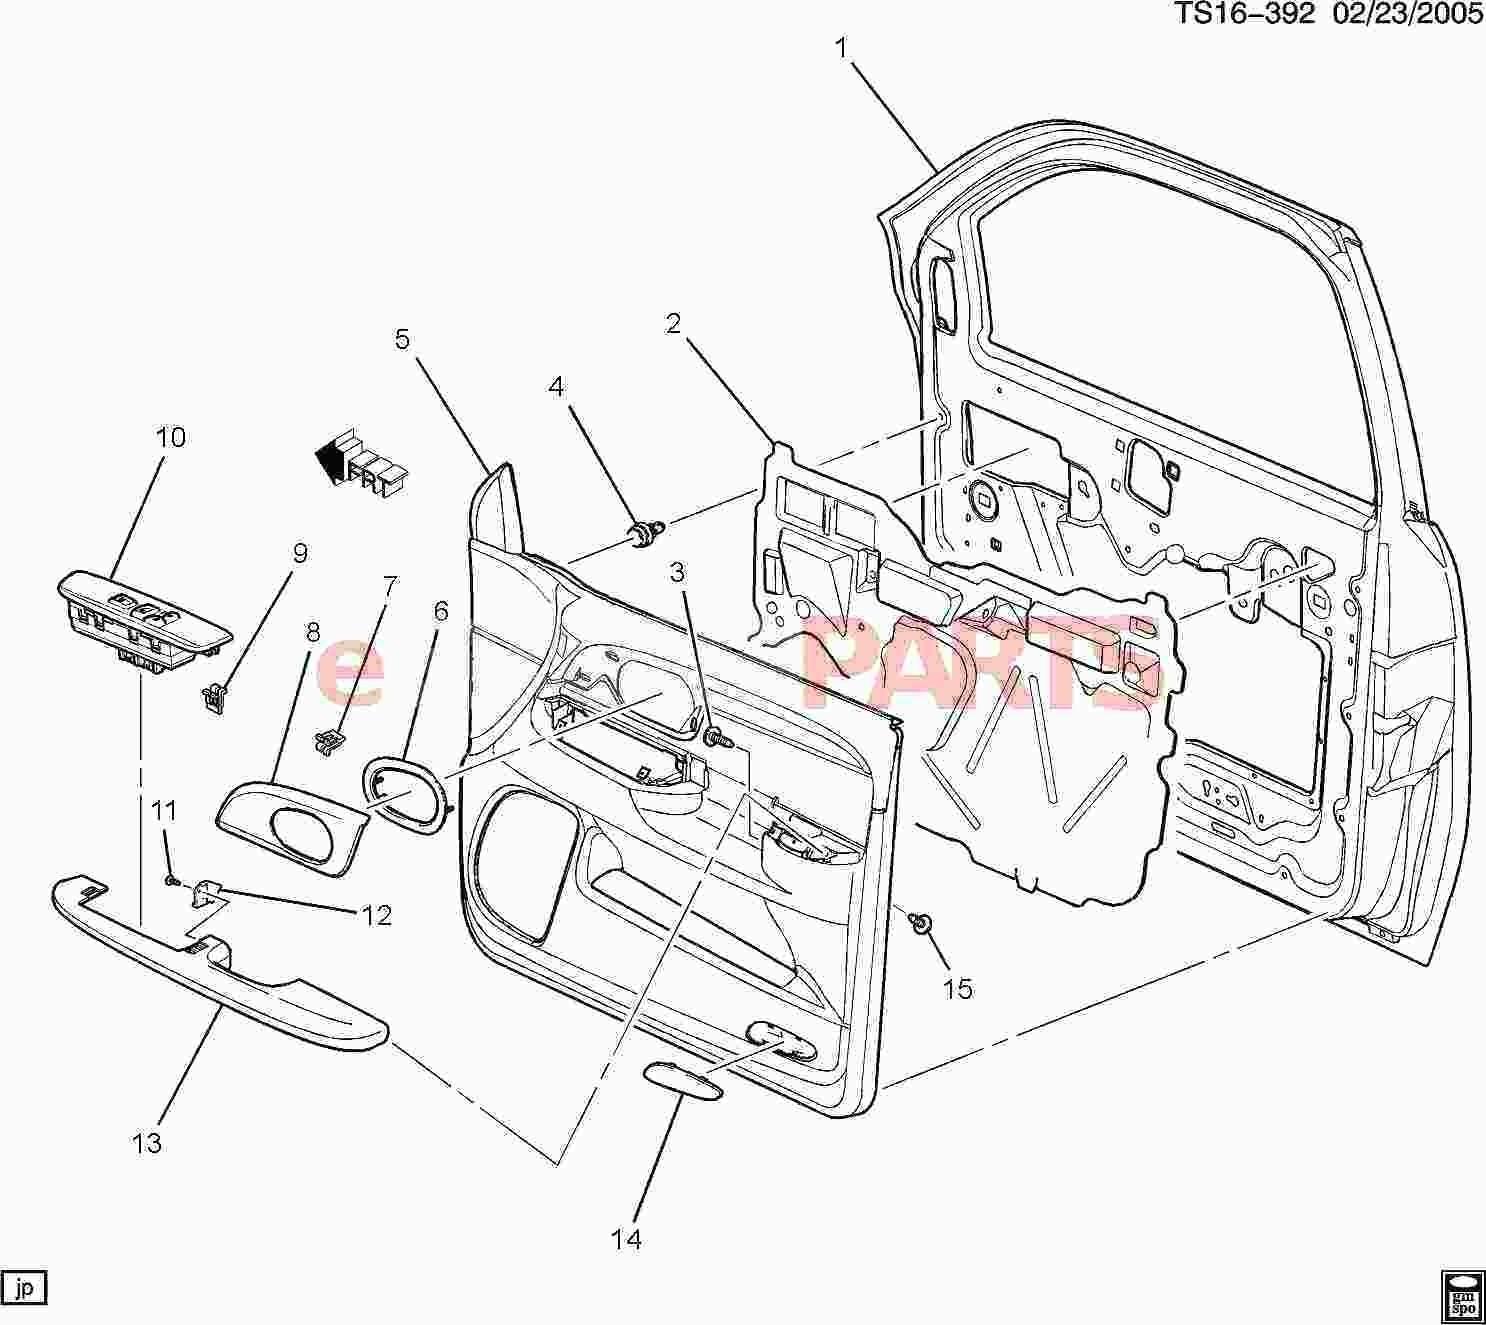 Car Parts Labeled Diagram Car Parts Diagram Under Hood Car Diagram ...